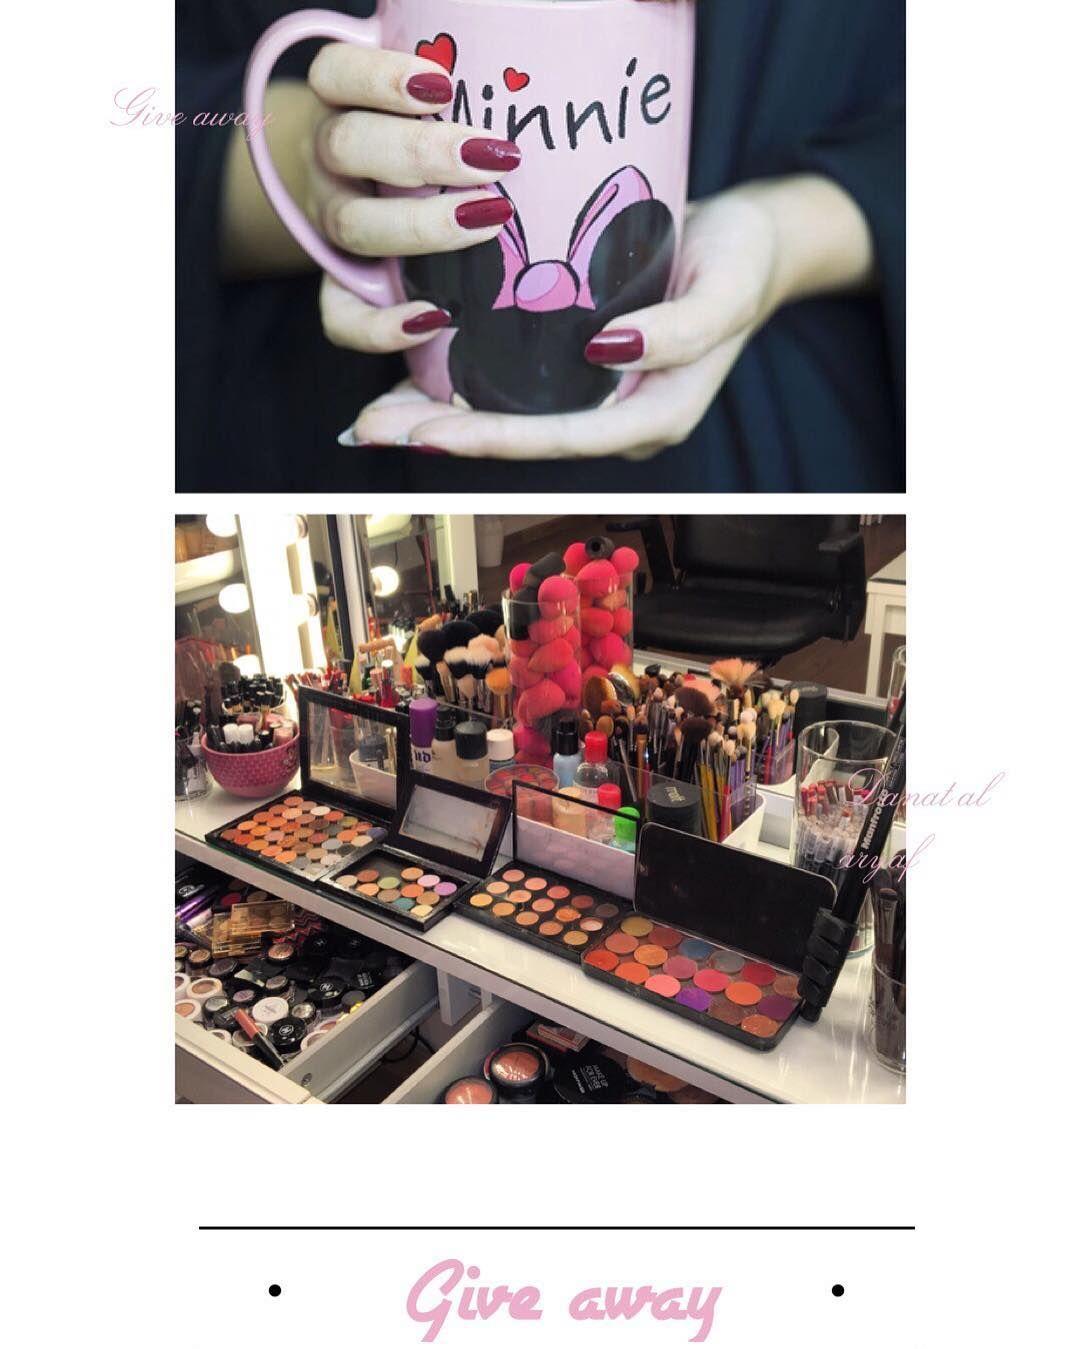 Instagram Photo By Waad Alturki Apr 23 2016 At 10 51am Utc Makeup Store Instagram Instagram Photo